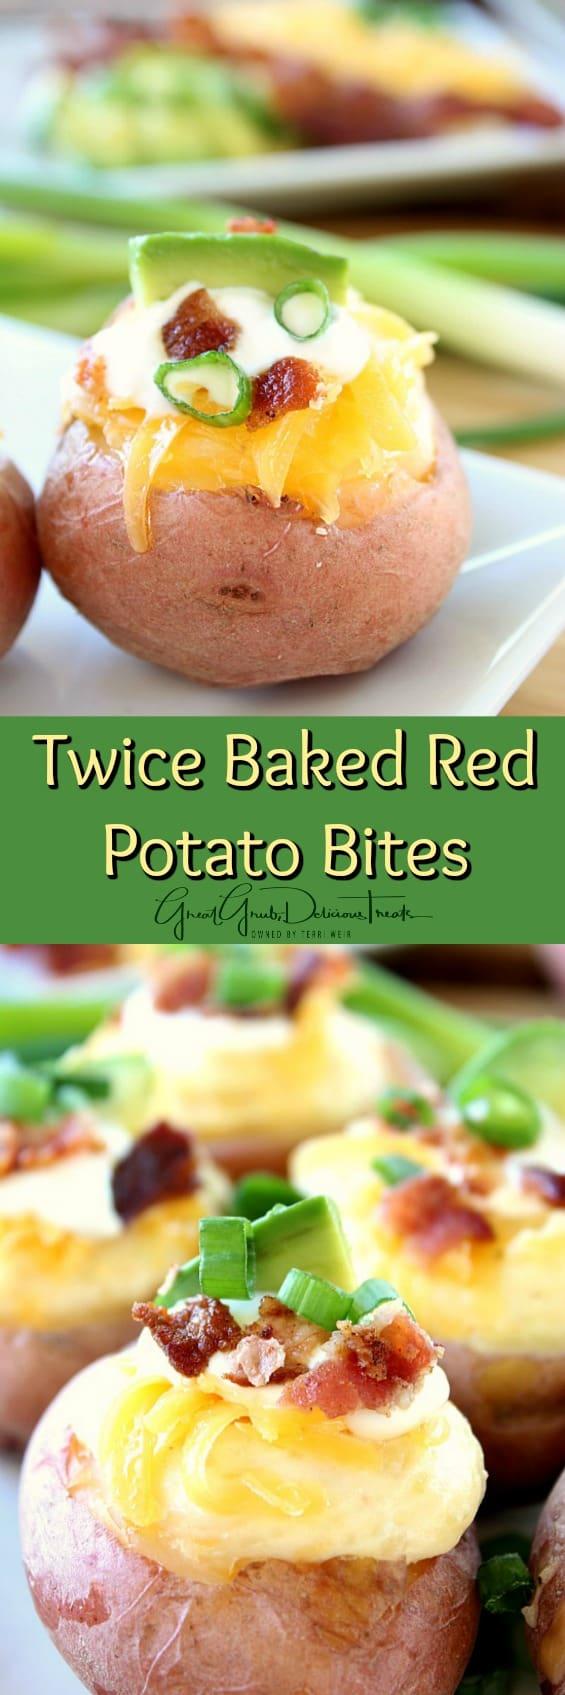 Twice Baked Red Potato Bites